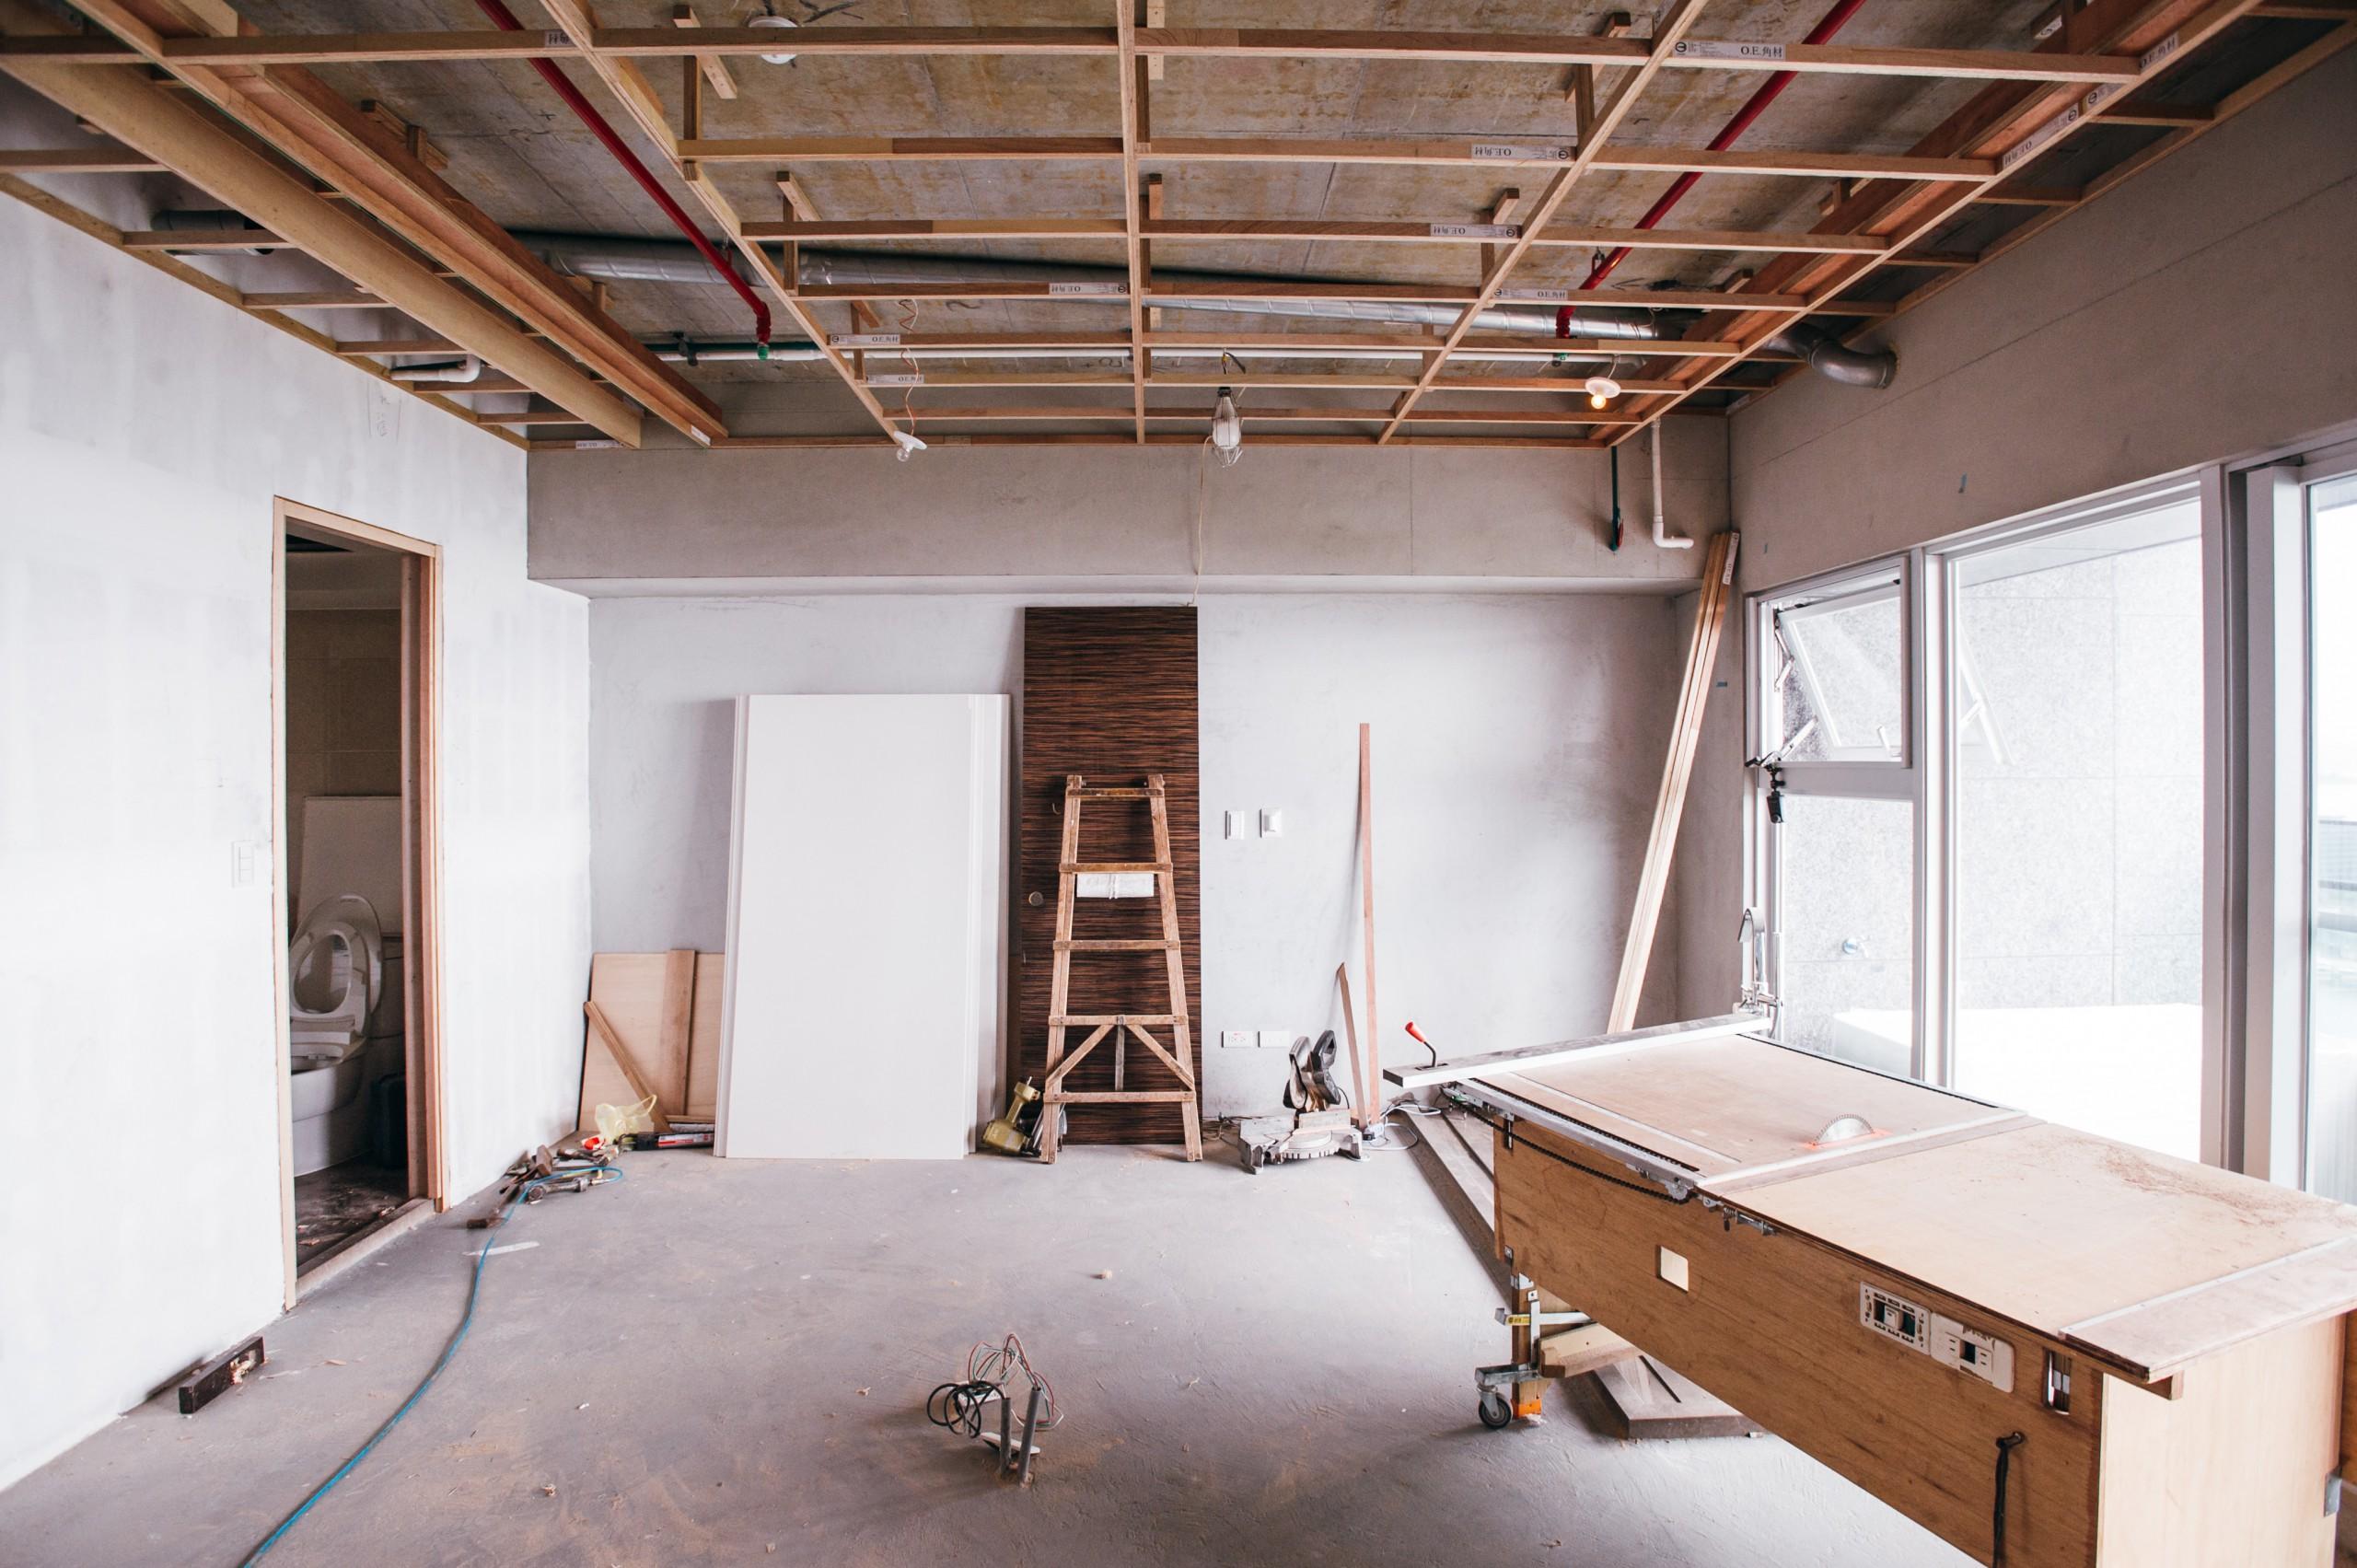 德築-DEZU-project-世界灣自宅裝修-architecture-interior-renovation-6